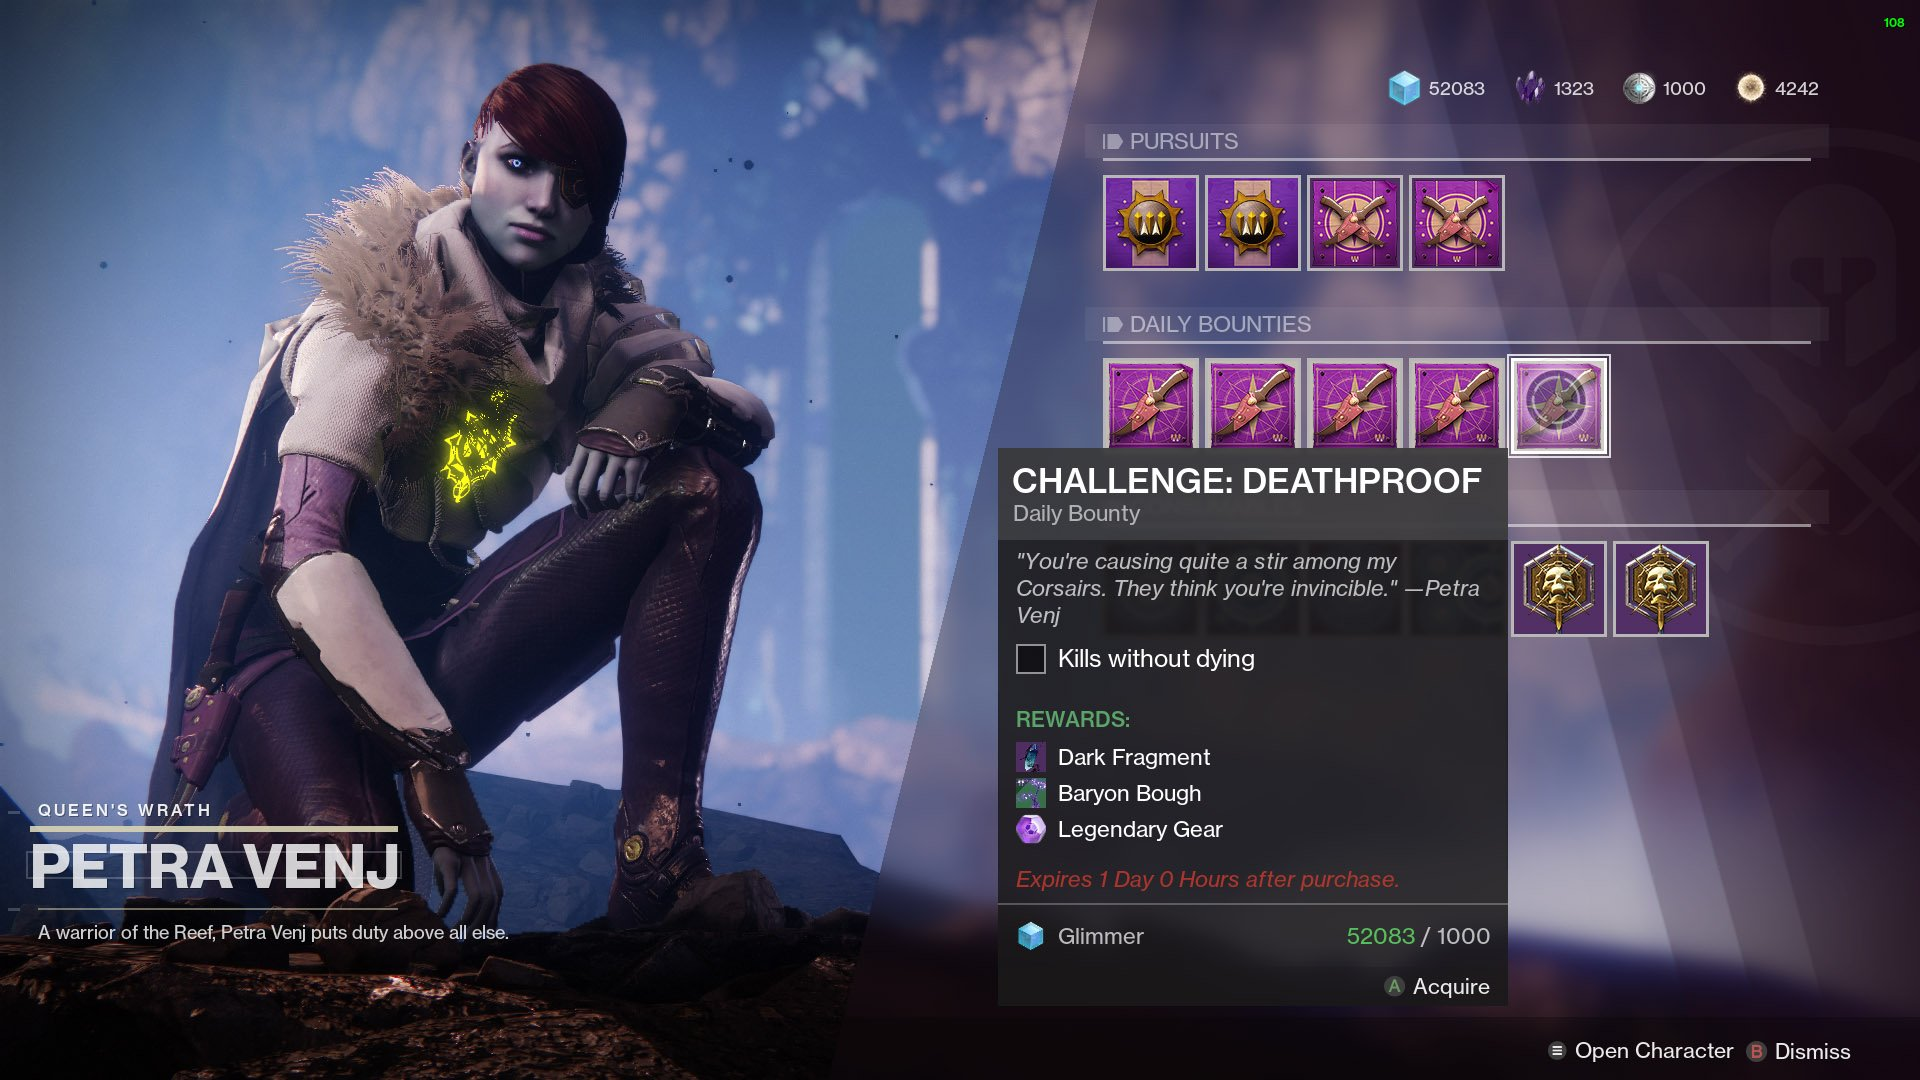 Challenge Deathproof Destiny 2